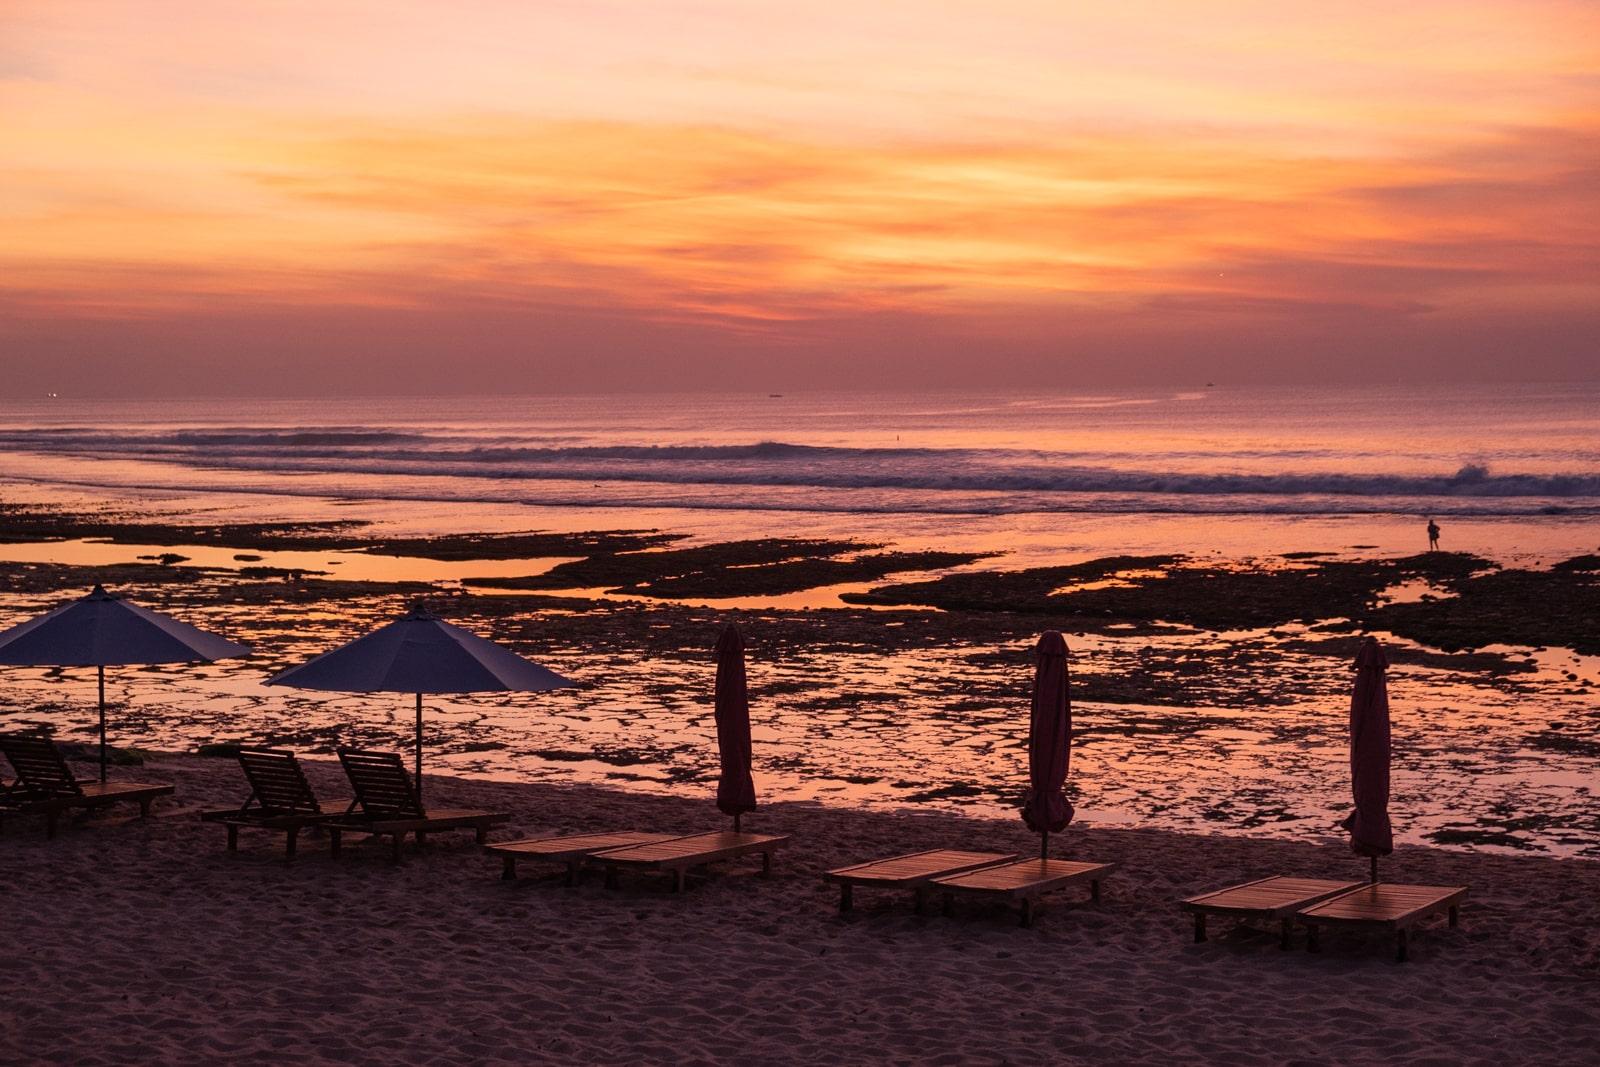 Bali : la Péninsule Sud - Balangan beach coucher de soleil | joliscarnets.net